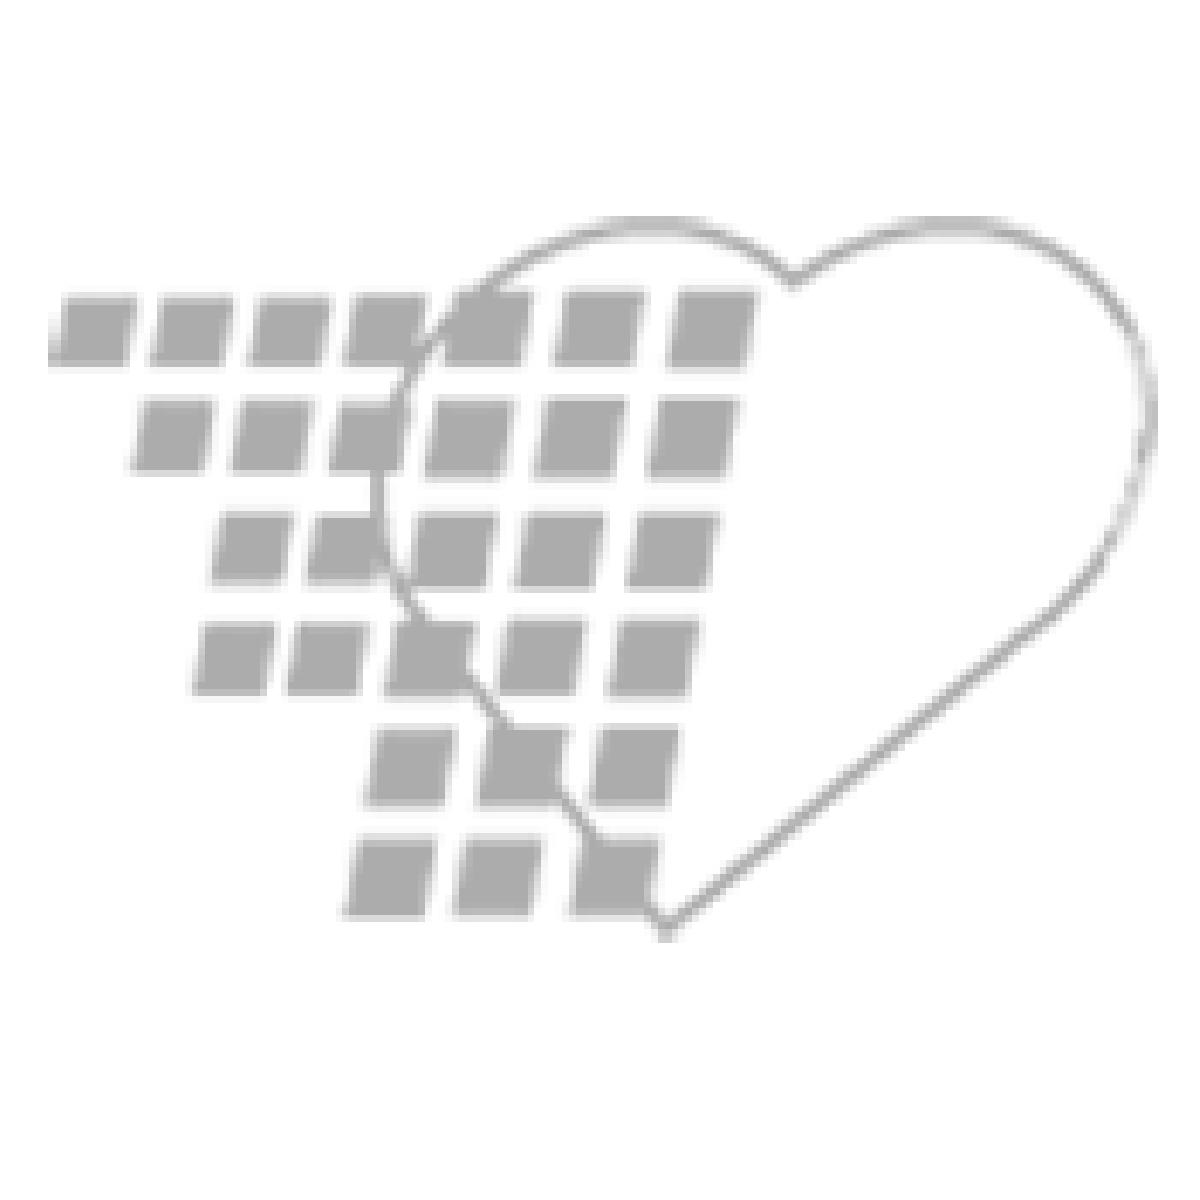 12-81-3521 Nasco Life/form® Infant Male and Female Catheterization Trainer